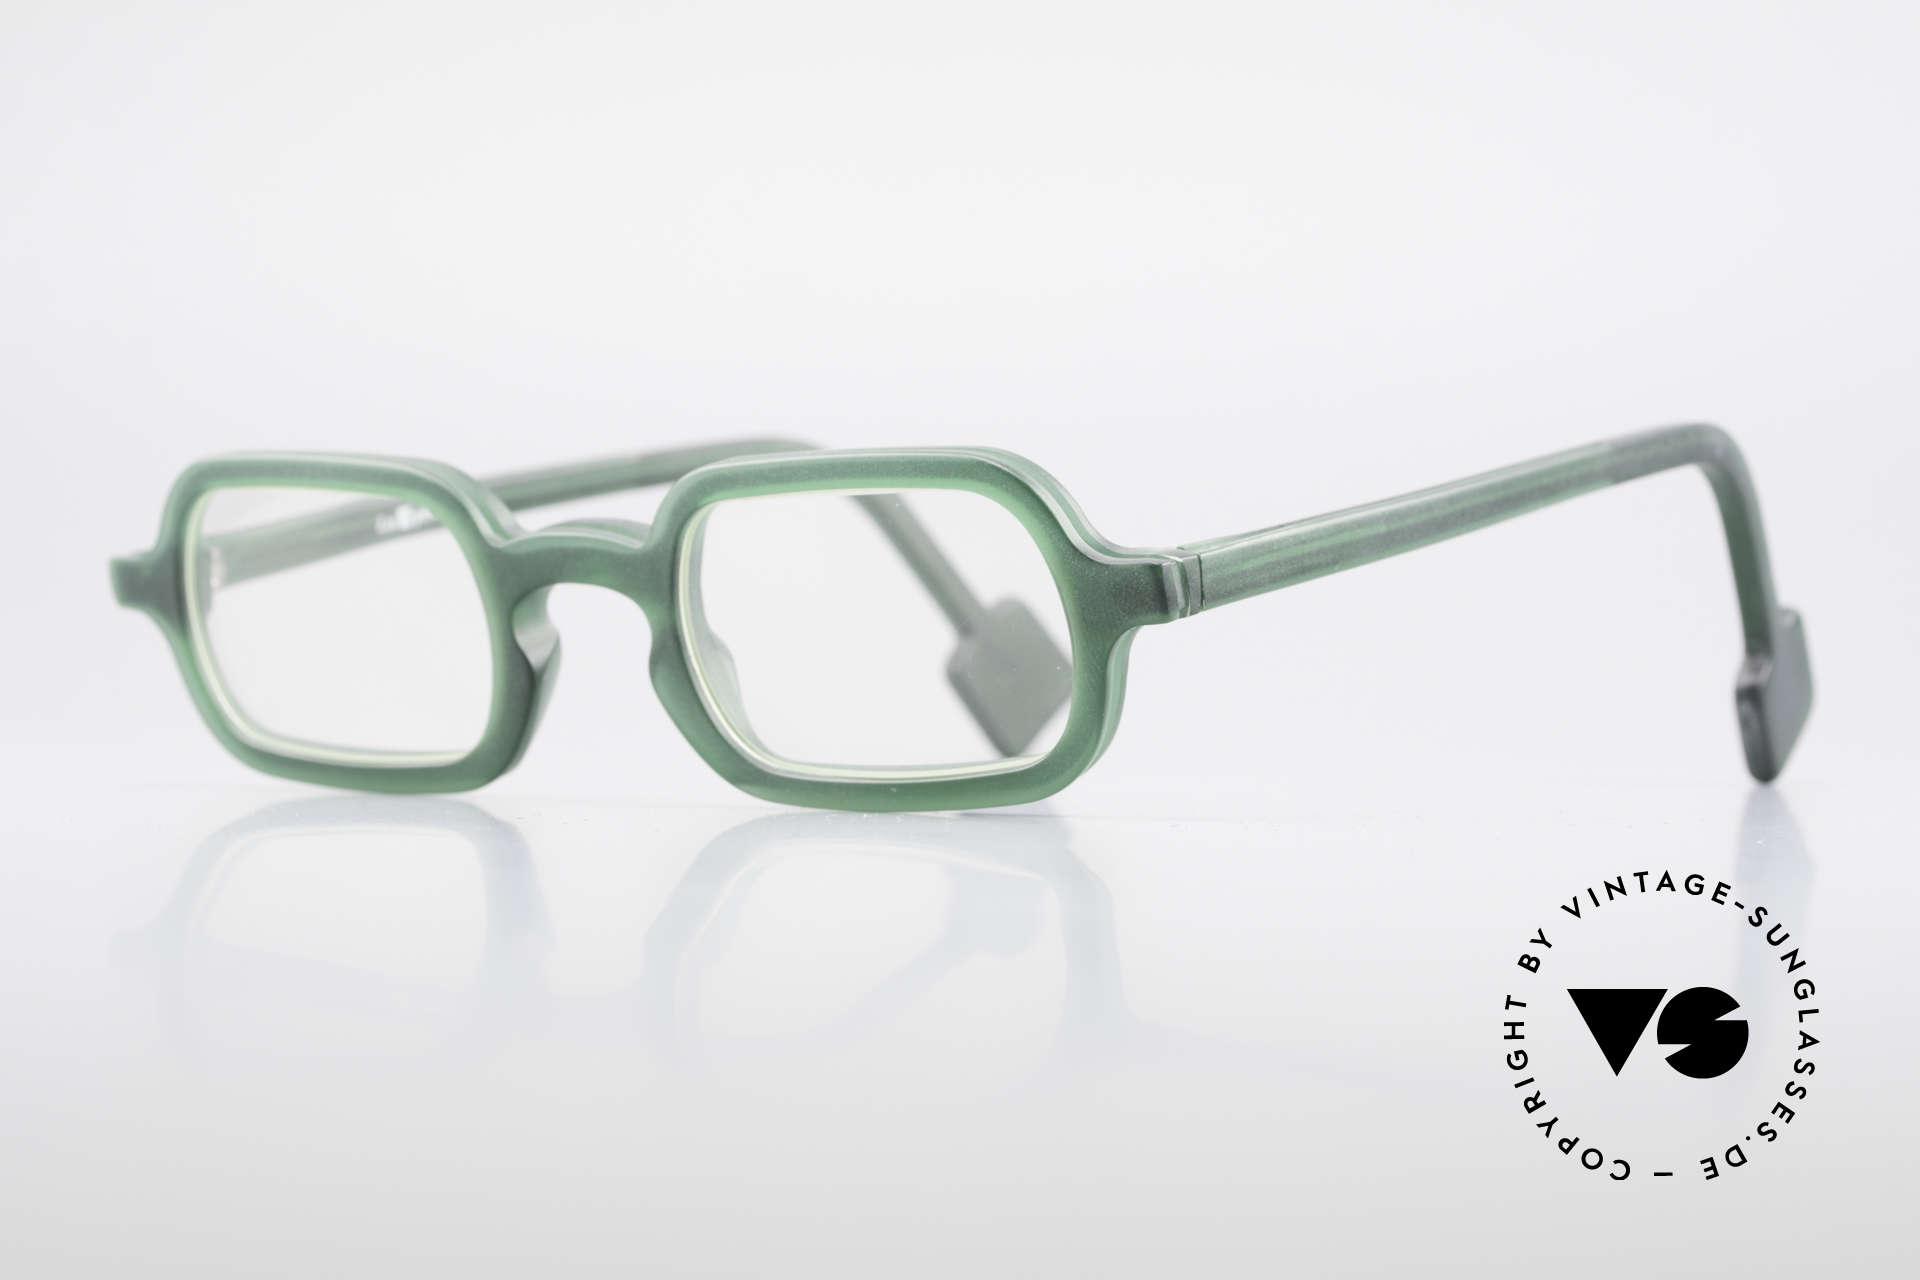 L.A. Eyeworks HANK 230 True Vintage 90's Eyeglasses, minimalist construction of simple geometric forms, Made for Men